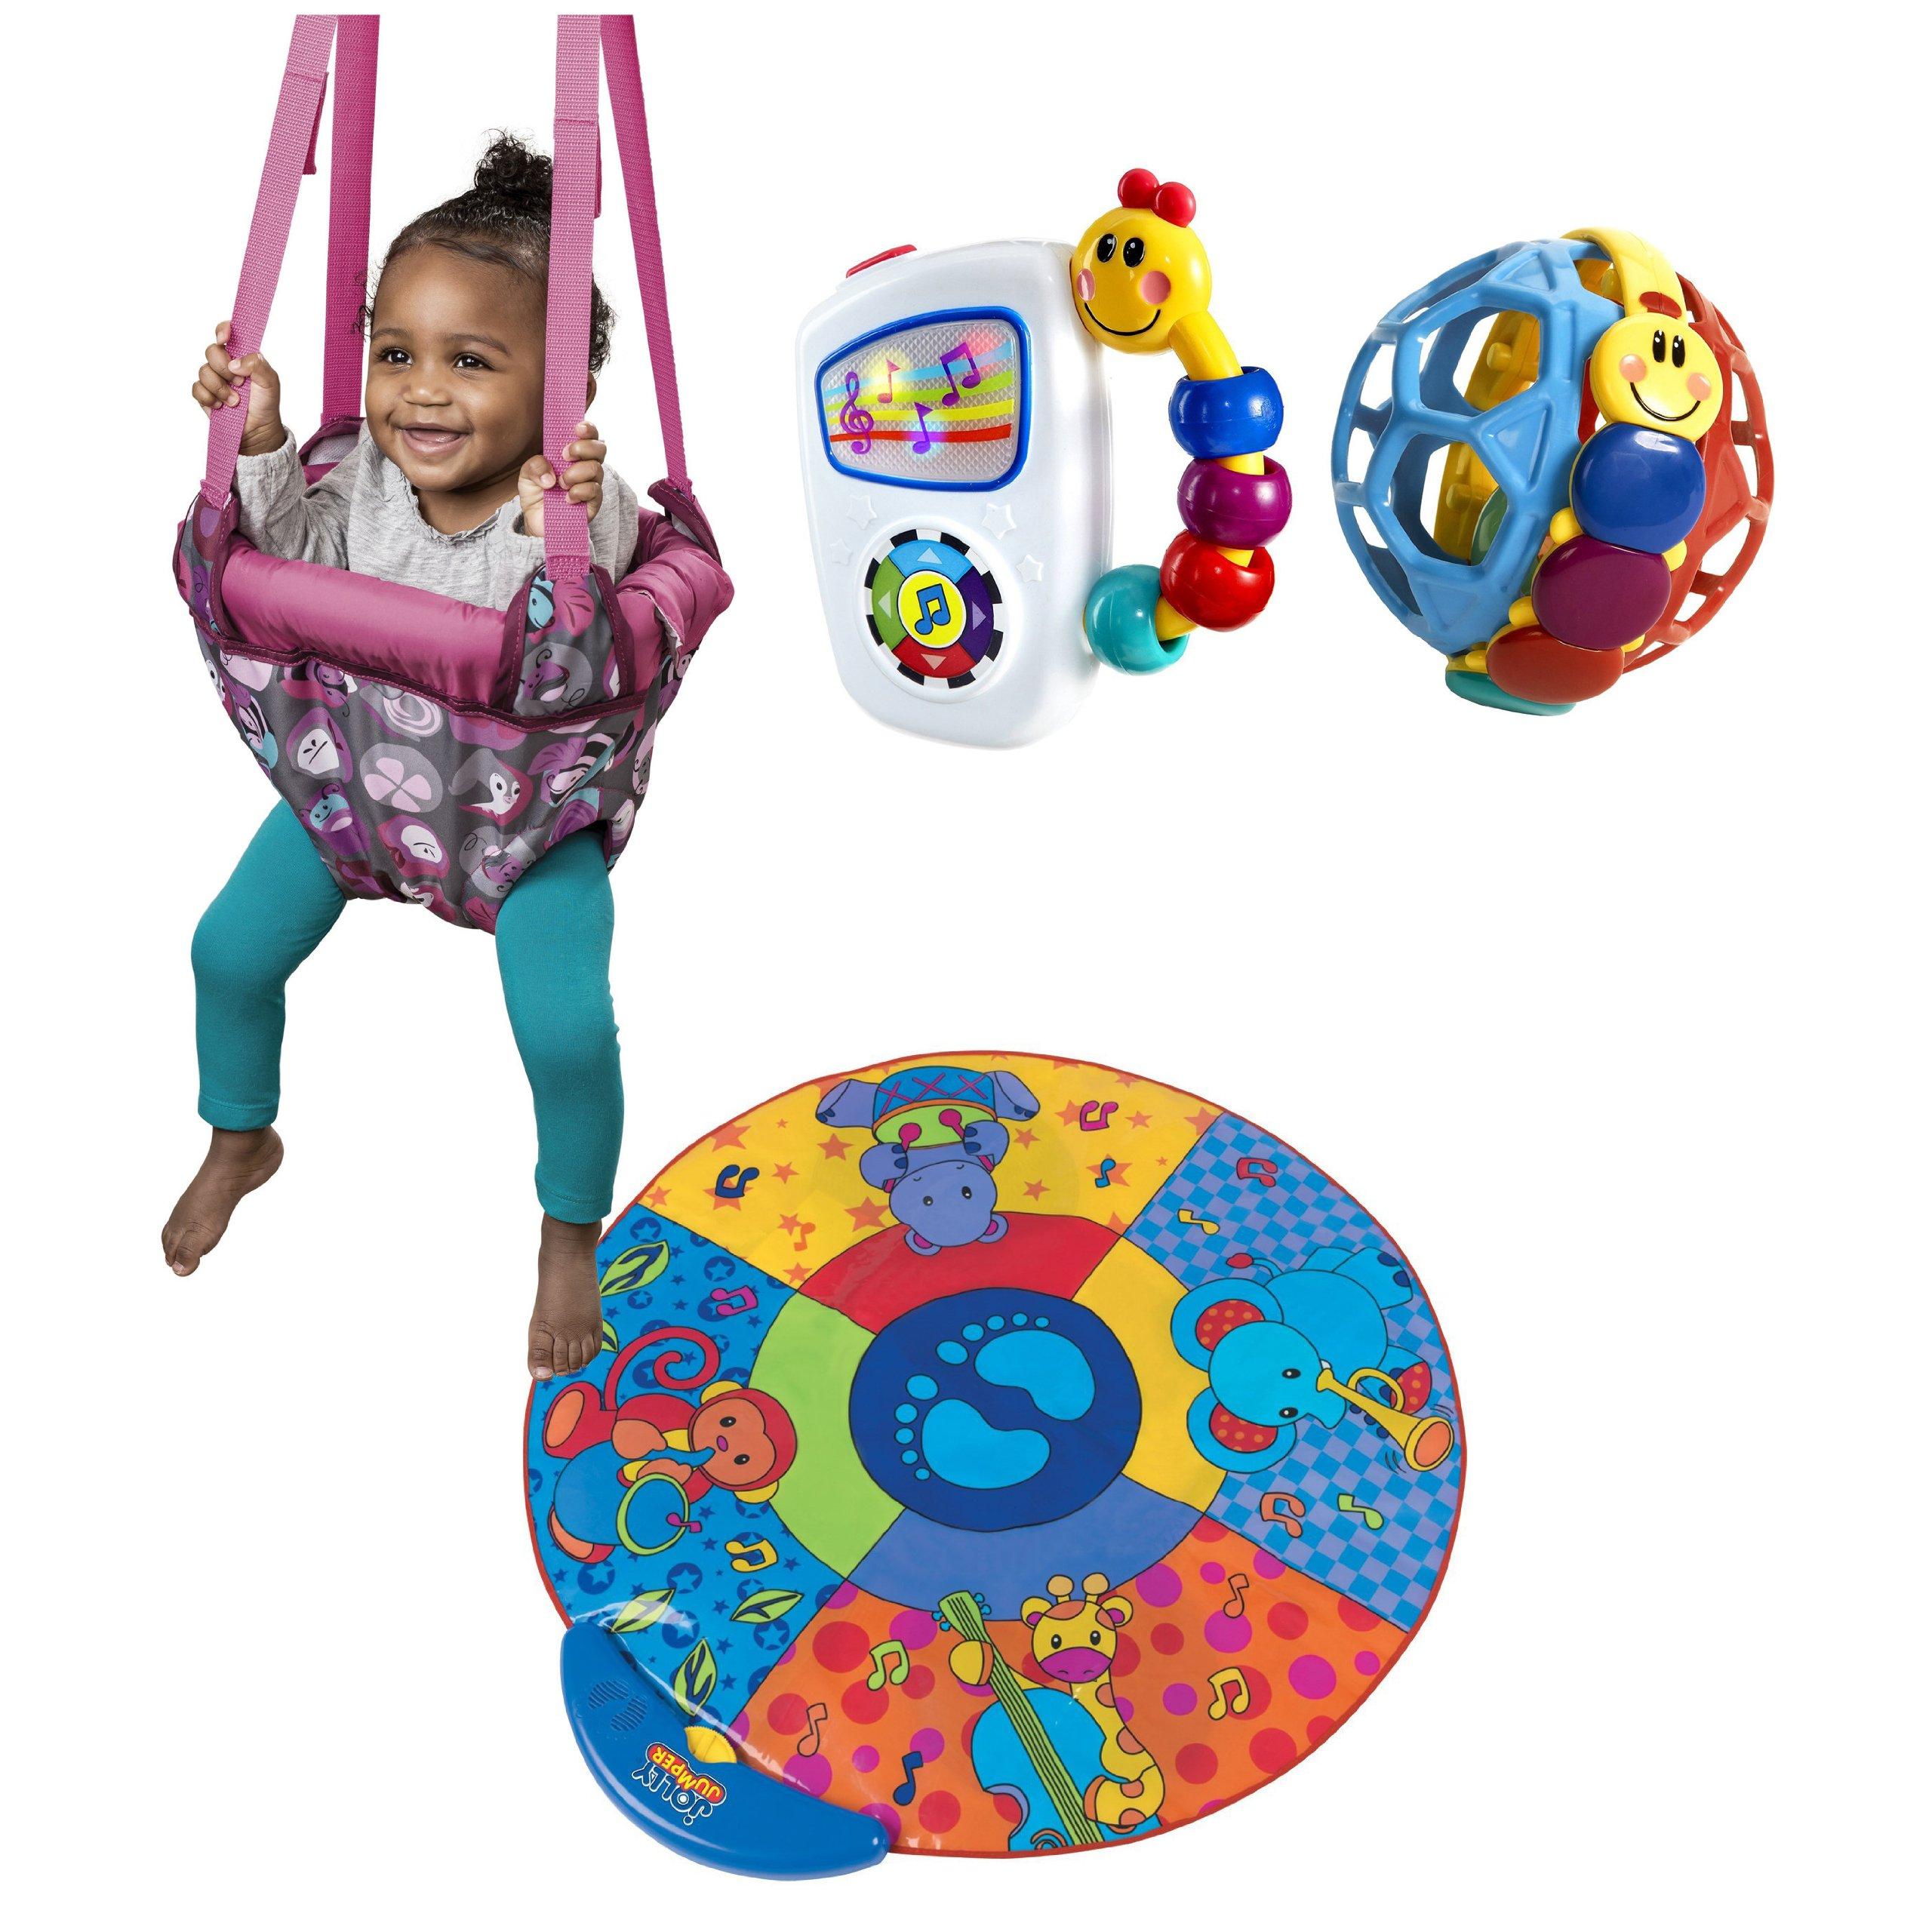 Evenflo Jenny Jump Up Doorway Jumper with Musical Mat & Baby Einstein Activity Toys